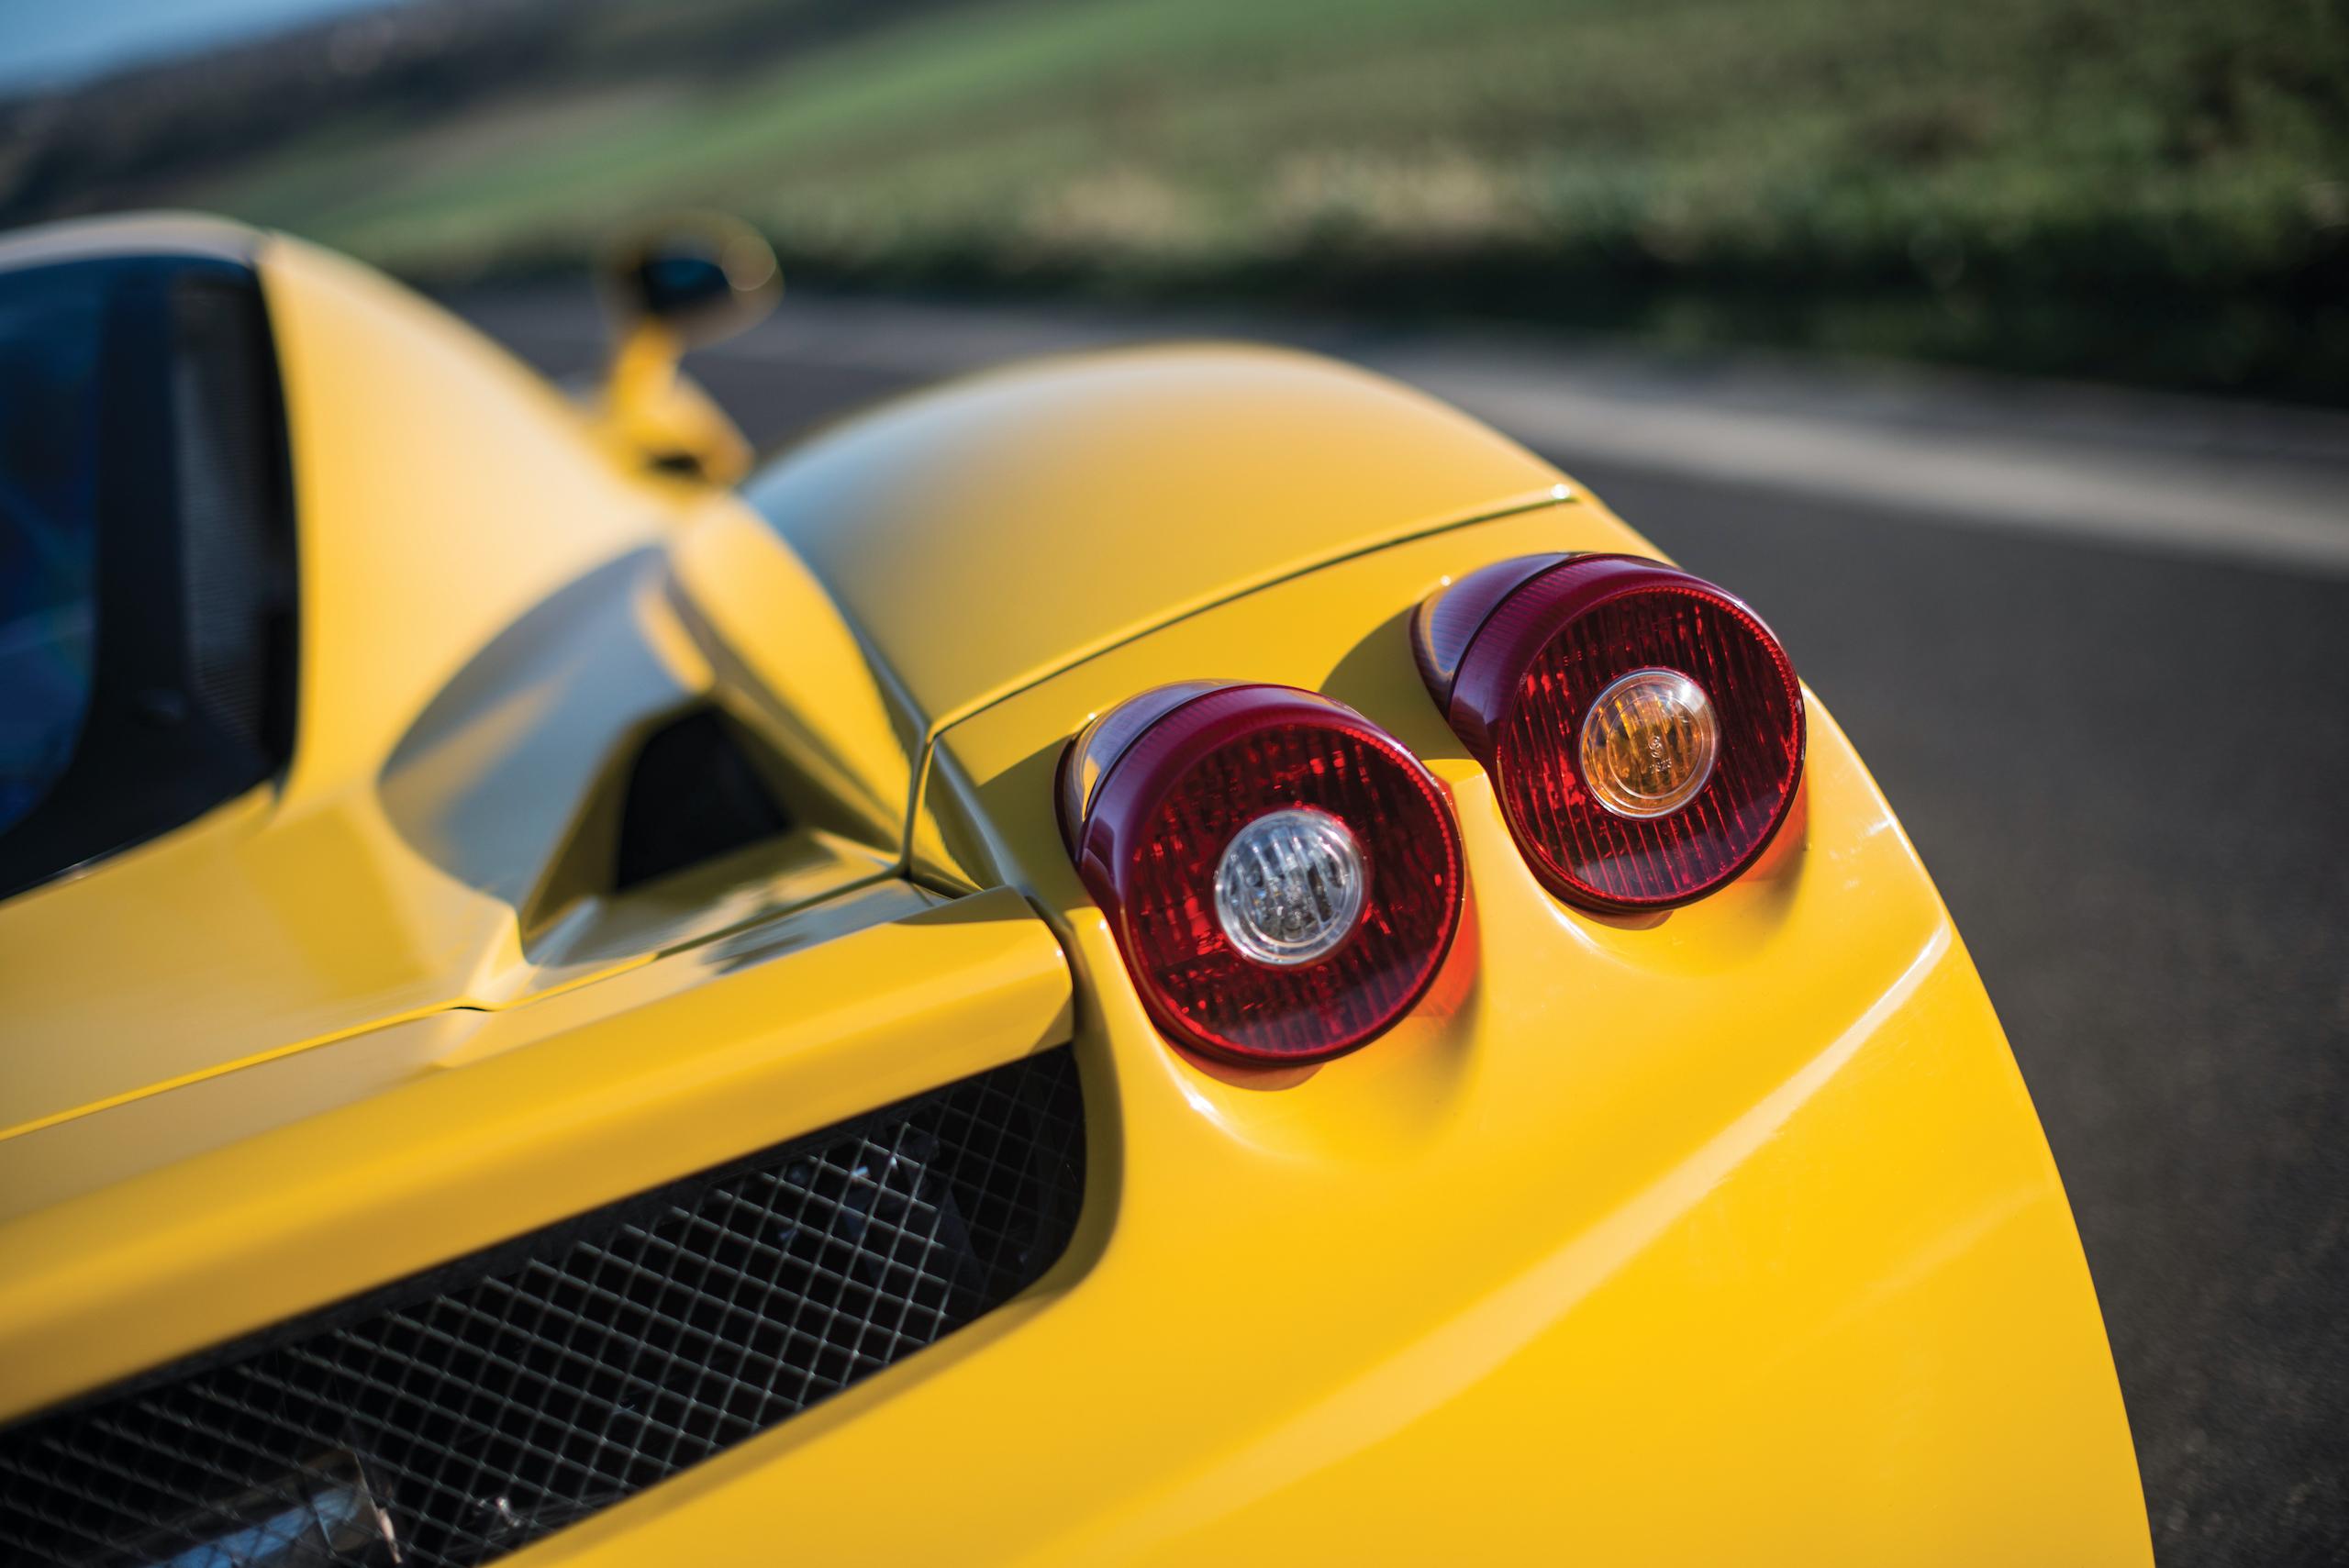 2002 Ferrari Enzo taillight detail